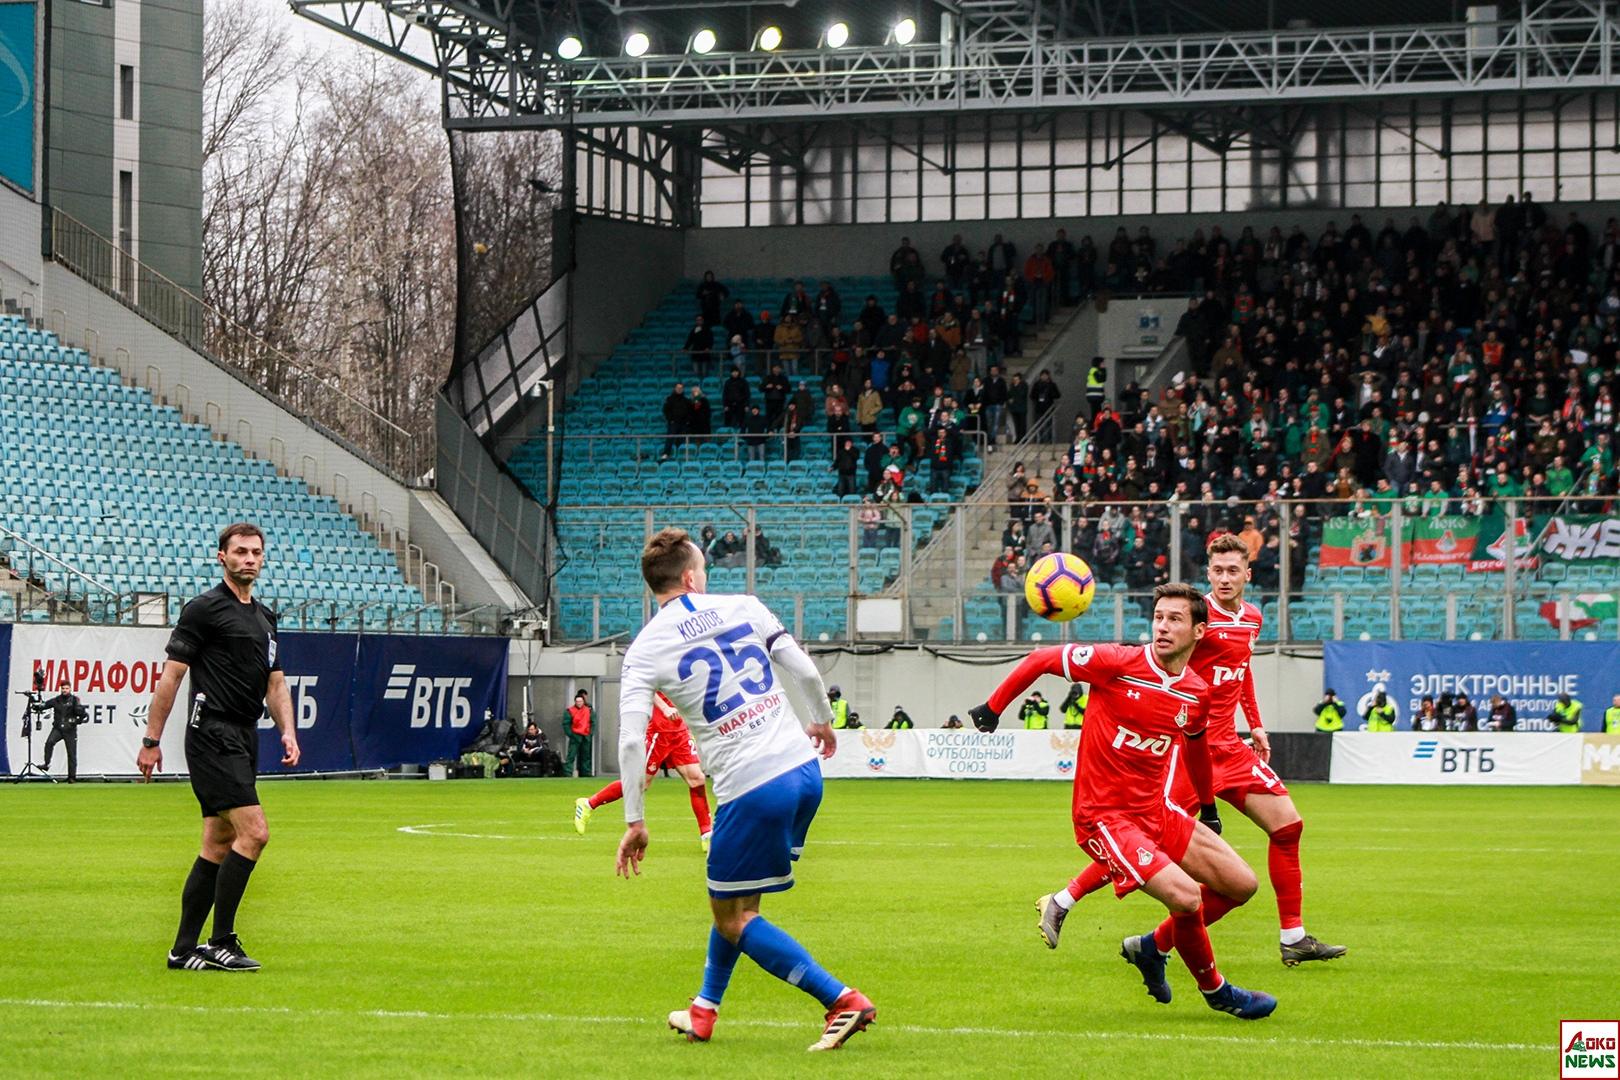 Динамо - Локомотив. Фото: Дмитрий Бурдонов / Loko.News